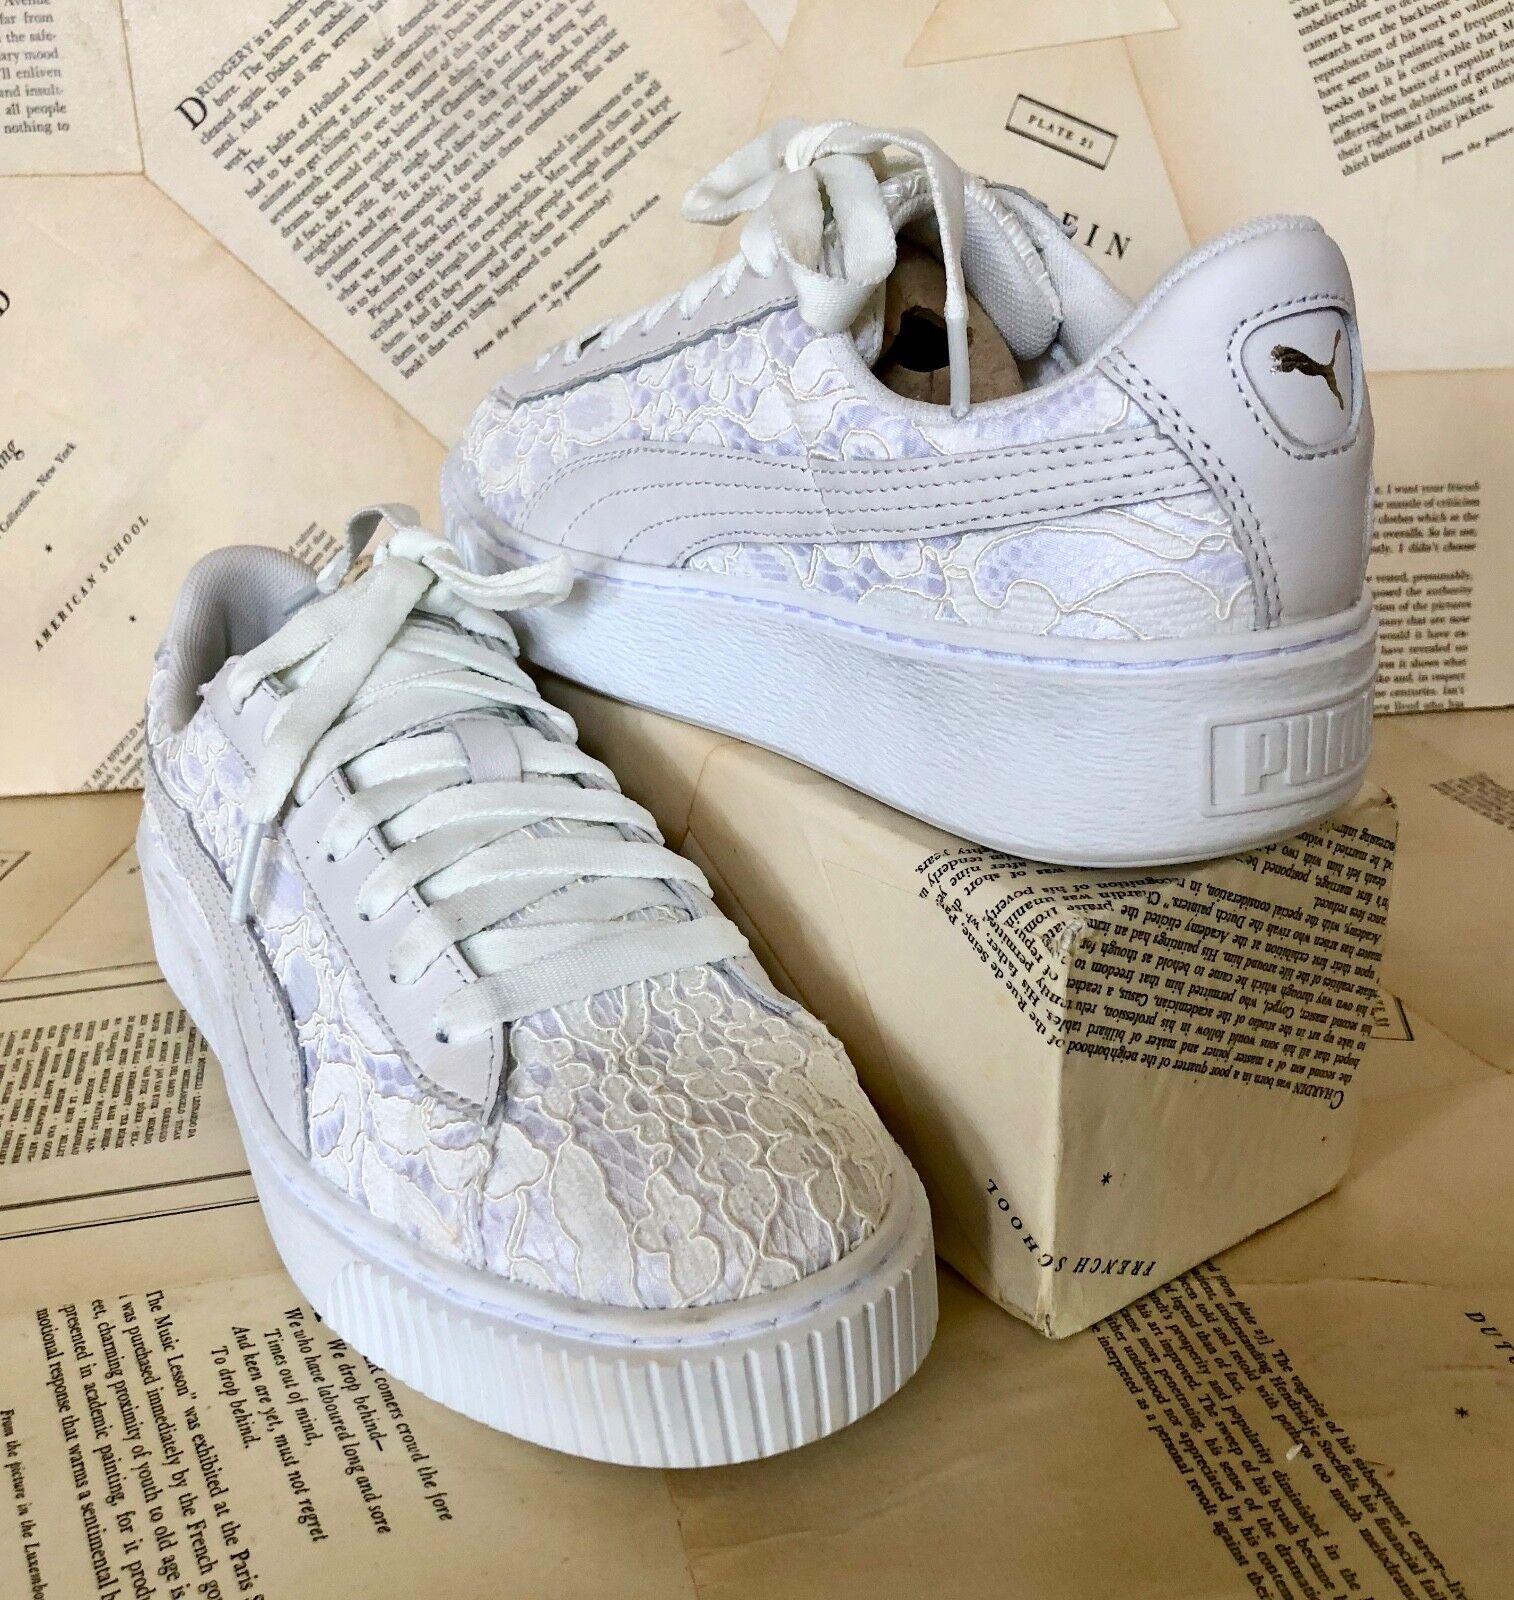 NEW Anthropologie Puma Weiß ivory Platform Floral 10 Lace Sneaker 41 / 10 Floral c5d6cb